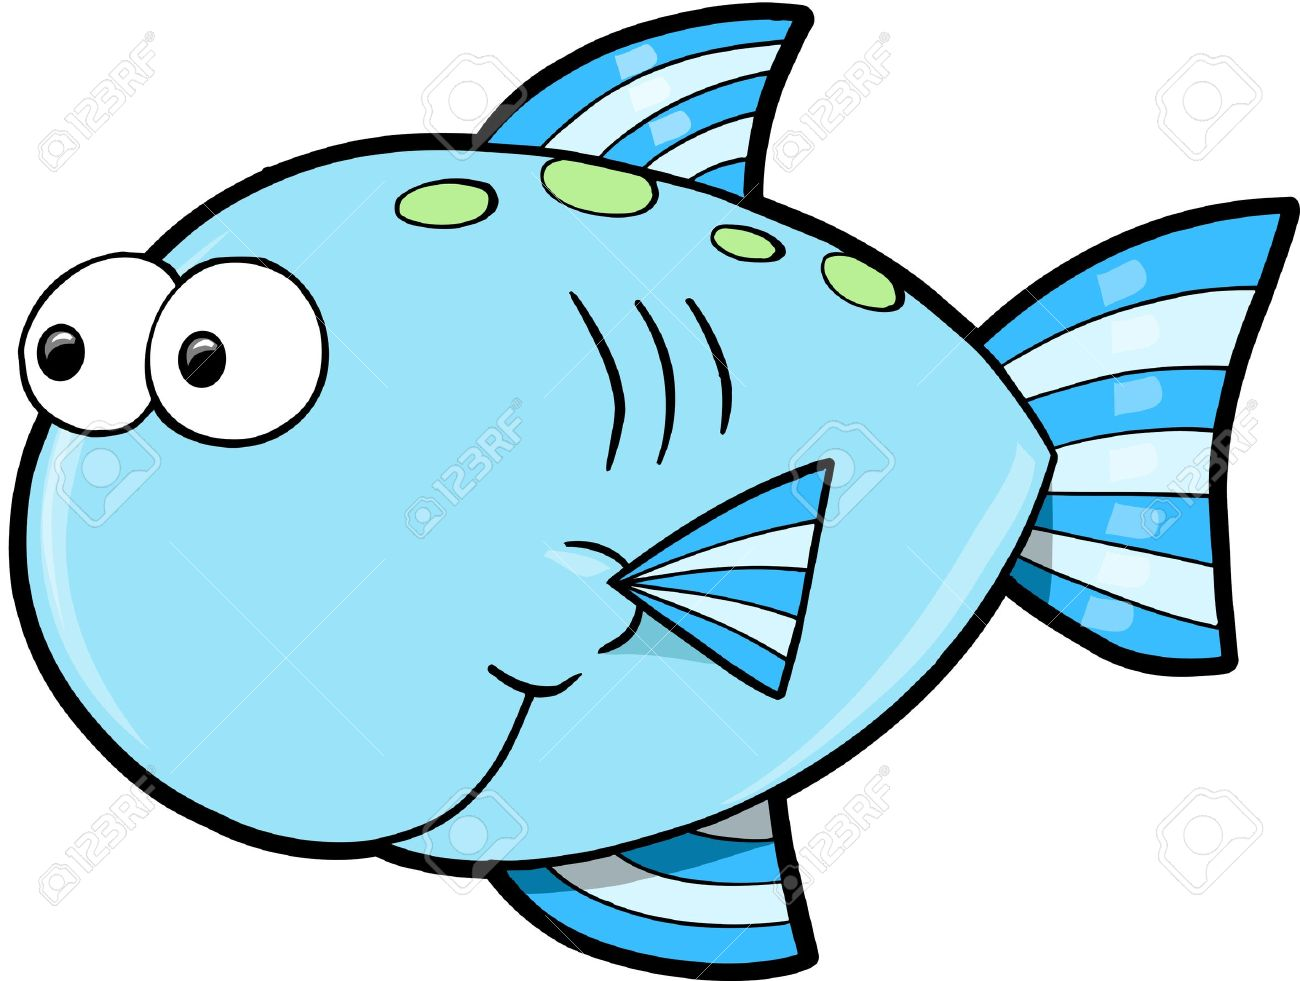 Silly Cute Fish Ocean Vector Illustration - 12413849